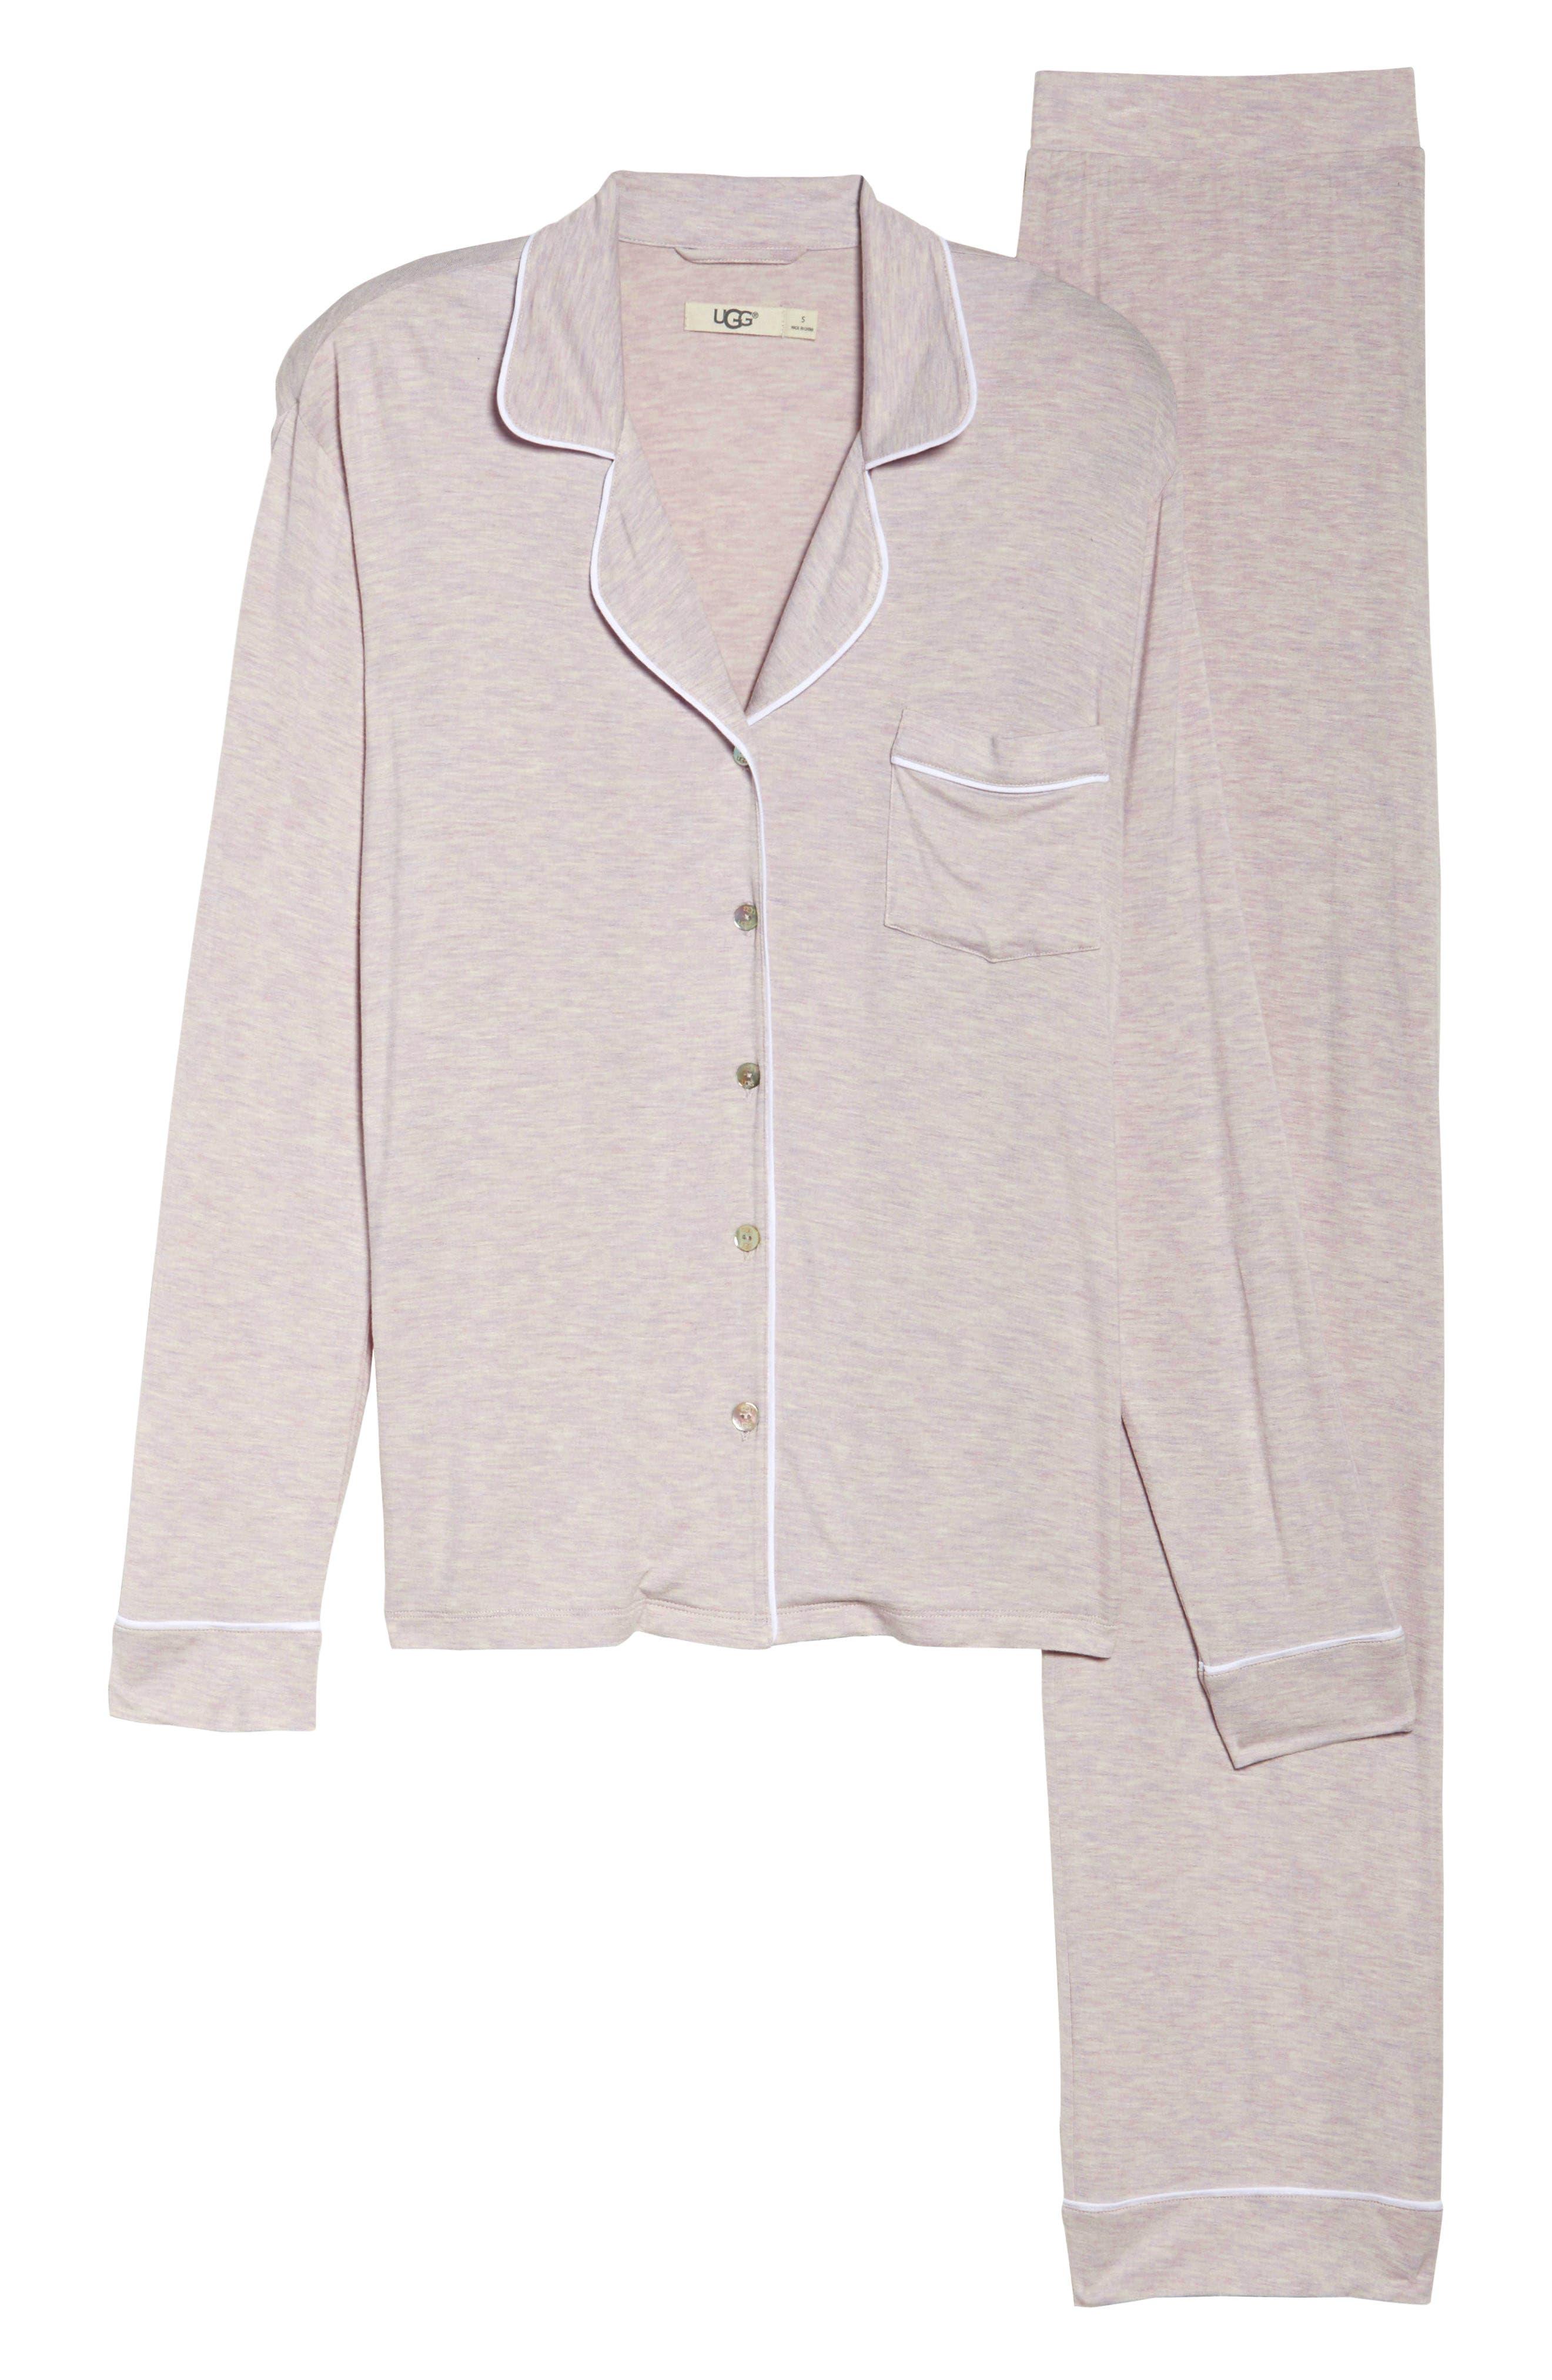 Lenon Jersey Pajamas,                             Alternate thumbnail 4, color,                             Lavender Fog Heather